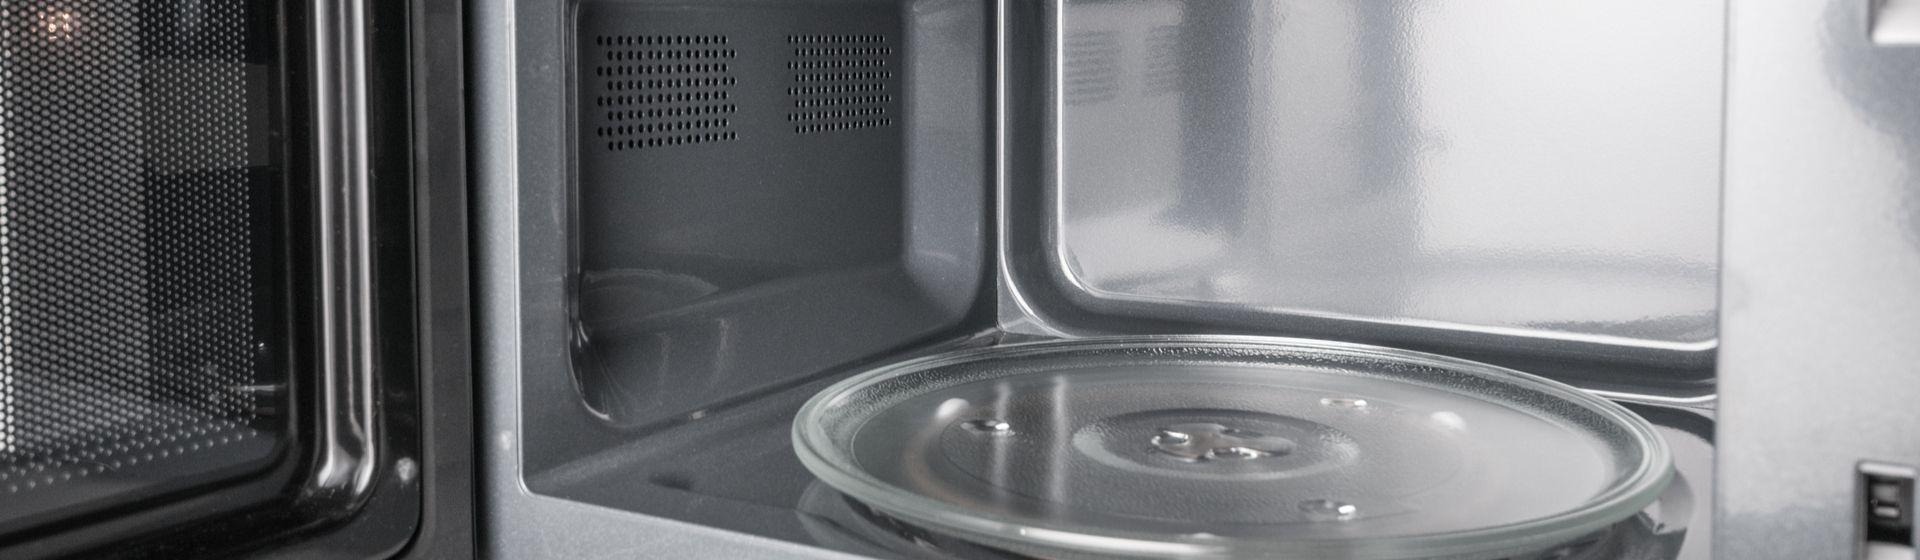 O Micro-ondas LG Easy Clean MS3059L vale a pena? Veja a análise da ficha técnica